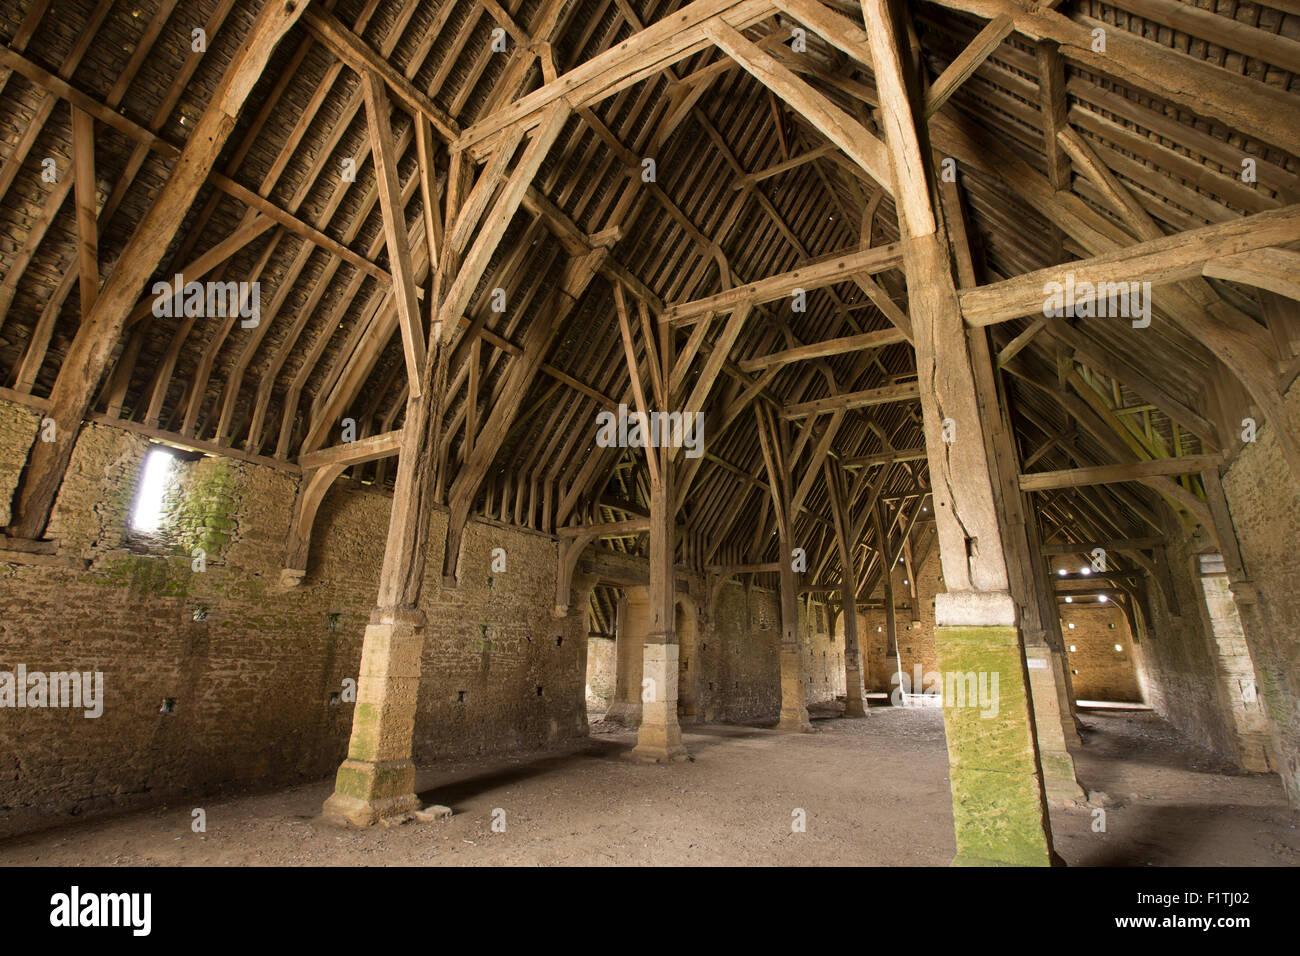 Uk Oxfordshire Faringdon Great Coxwell 14th Century